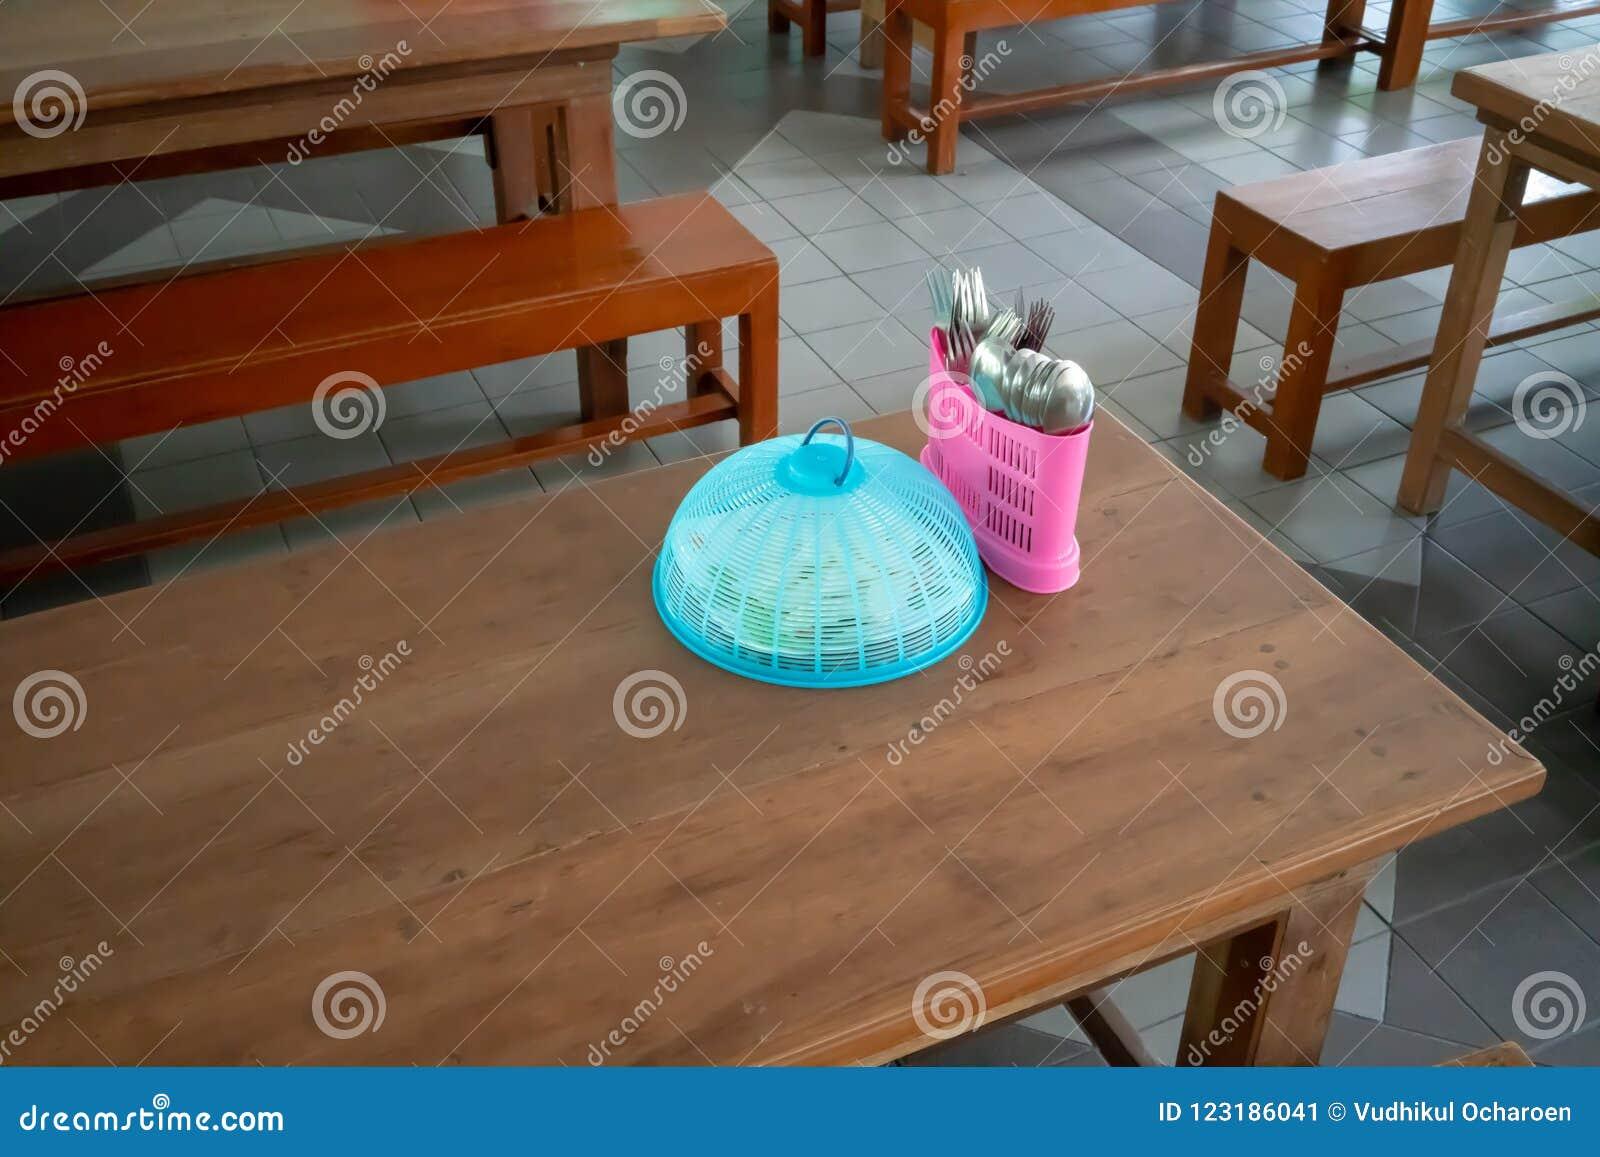 Incredible Wooden Table Set Up With Long Bench For Kindergarten Creativecarmelina Interior Chair Design Creativecarmelinacom